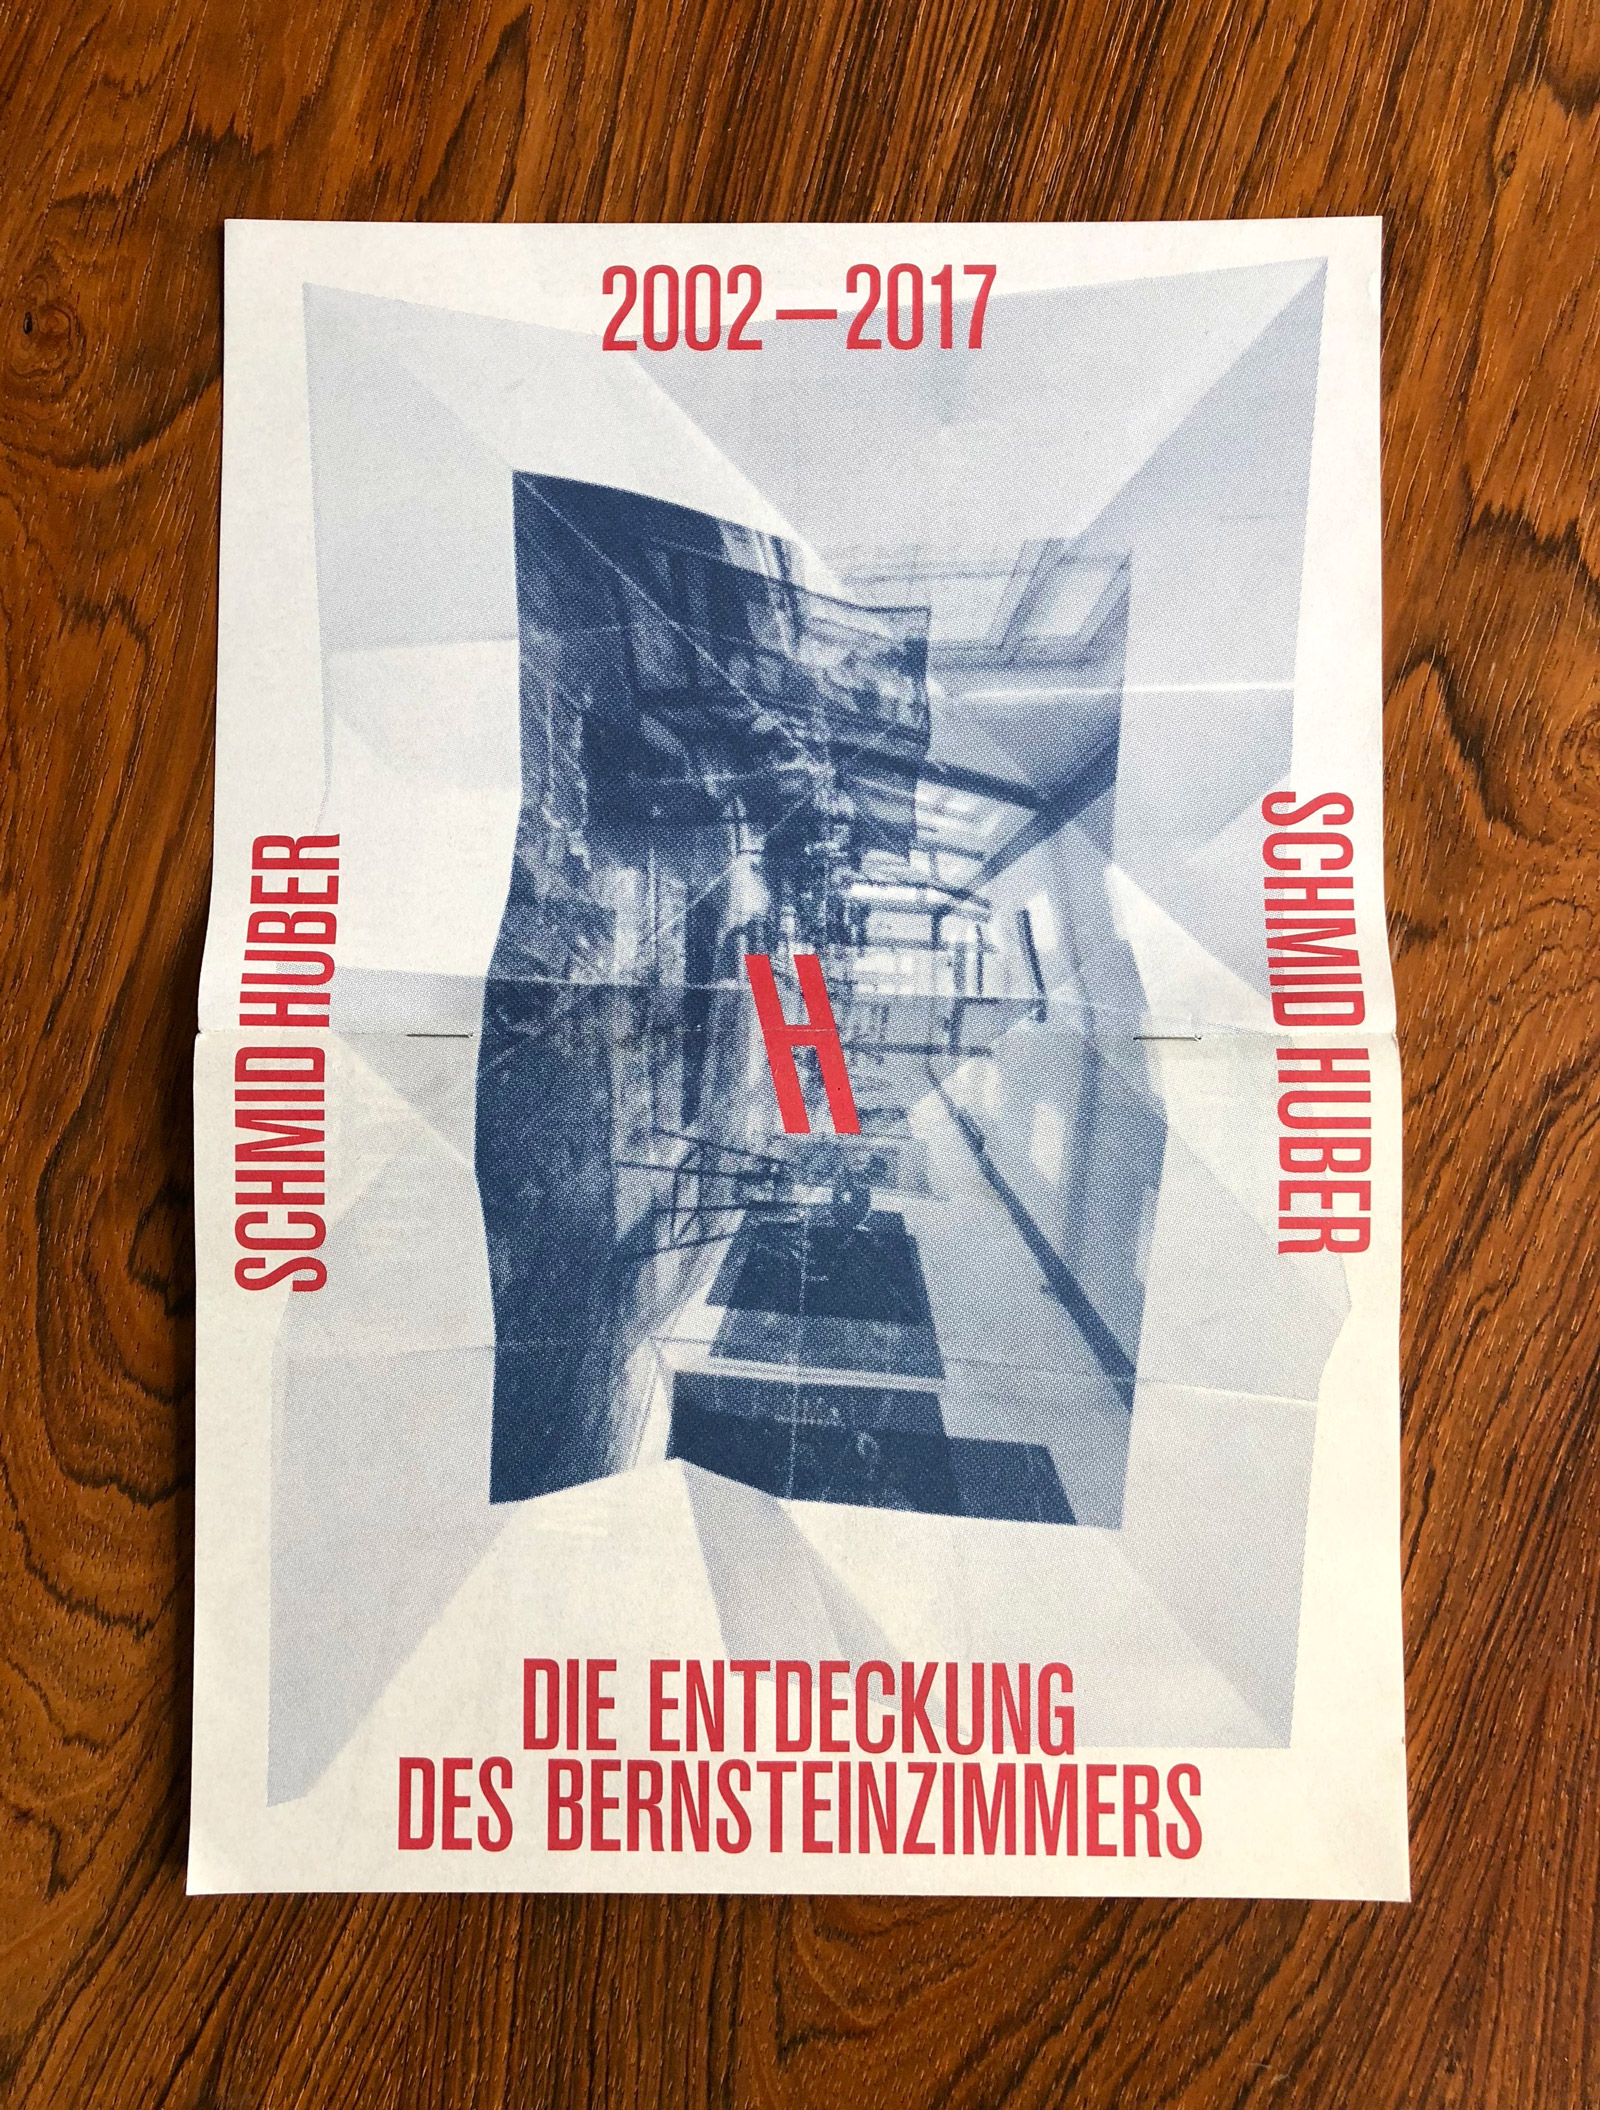 Bernsteinzimmers Schmidhuber